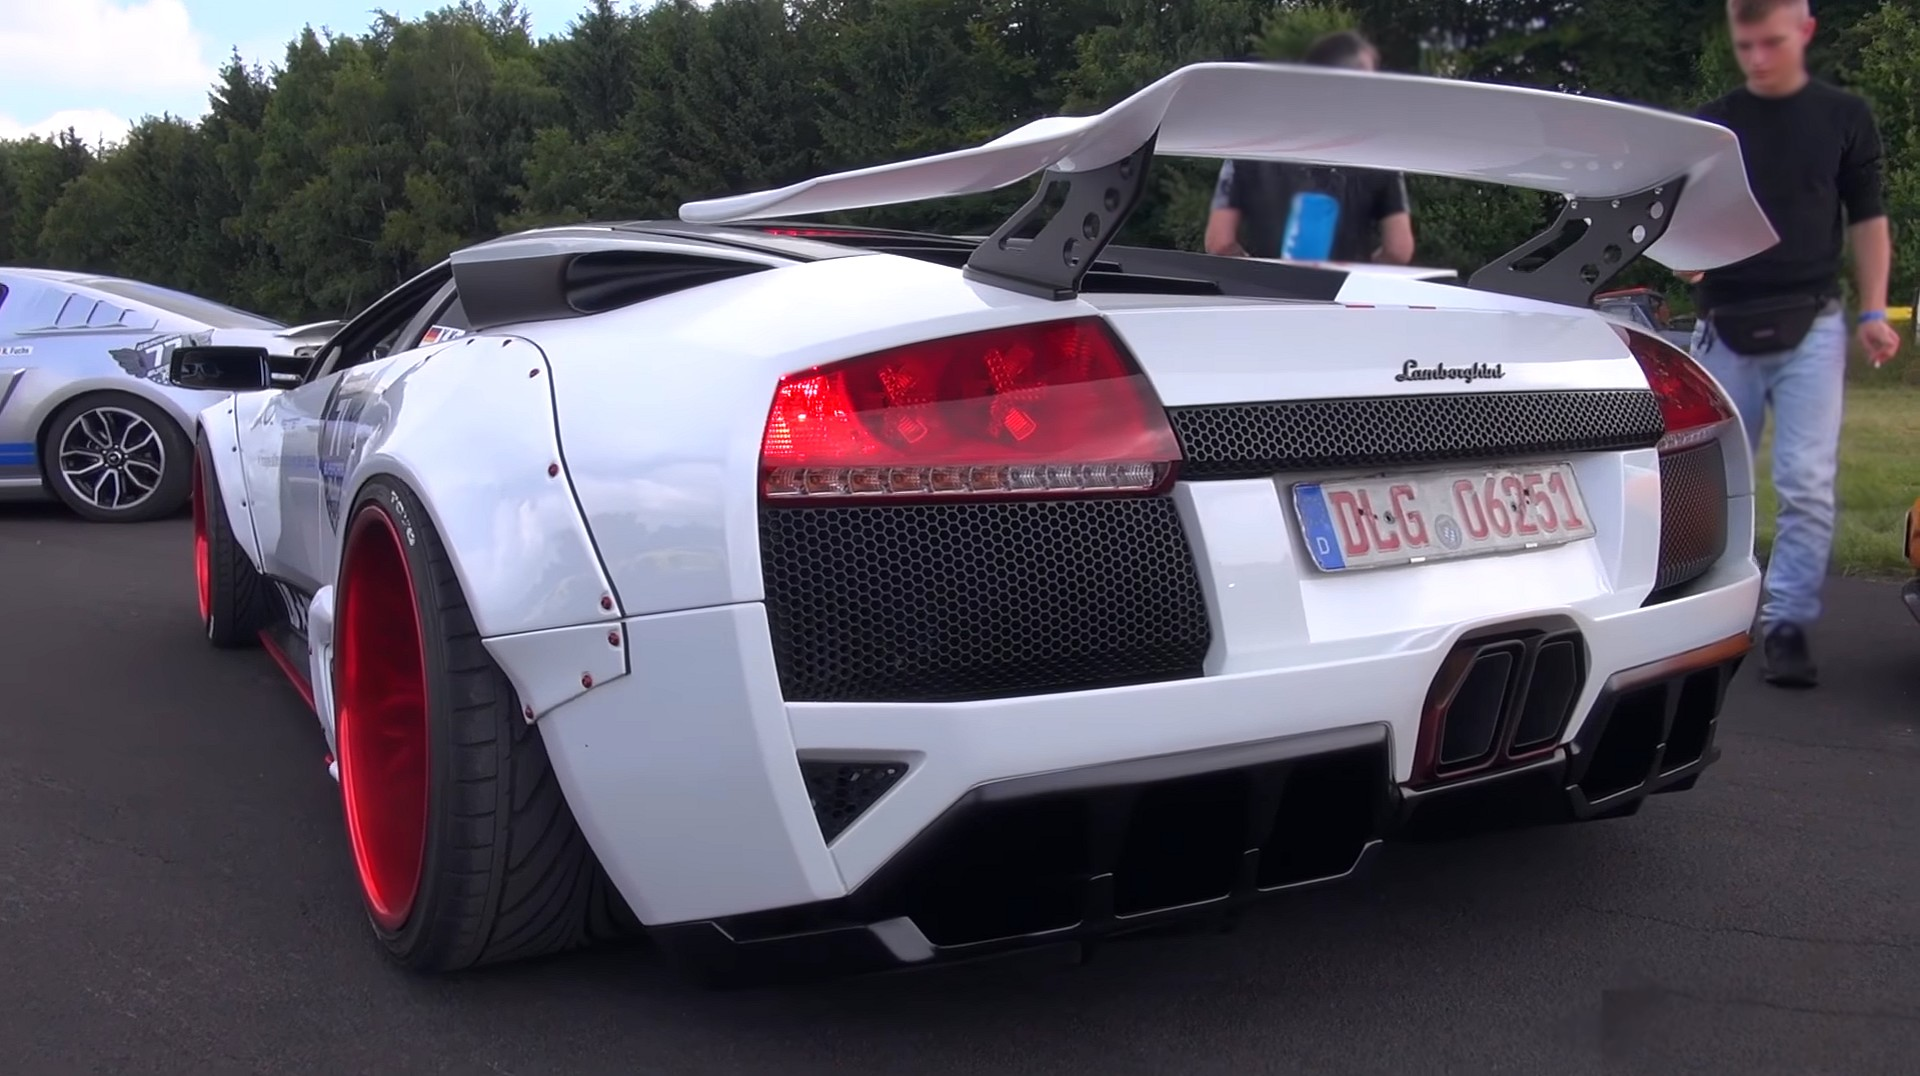 Libertywalk Lb R Limited Lamborghini Murcielago In Action